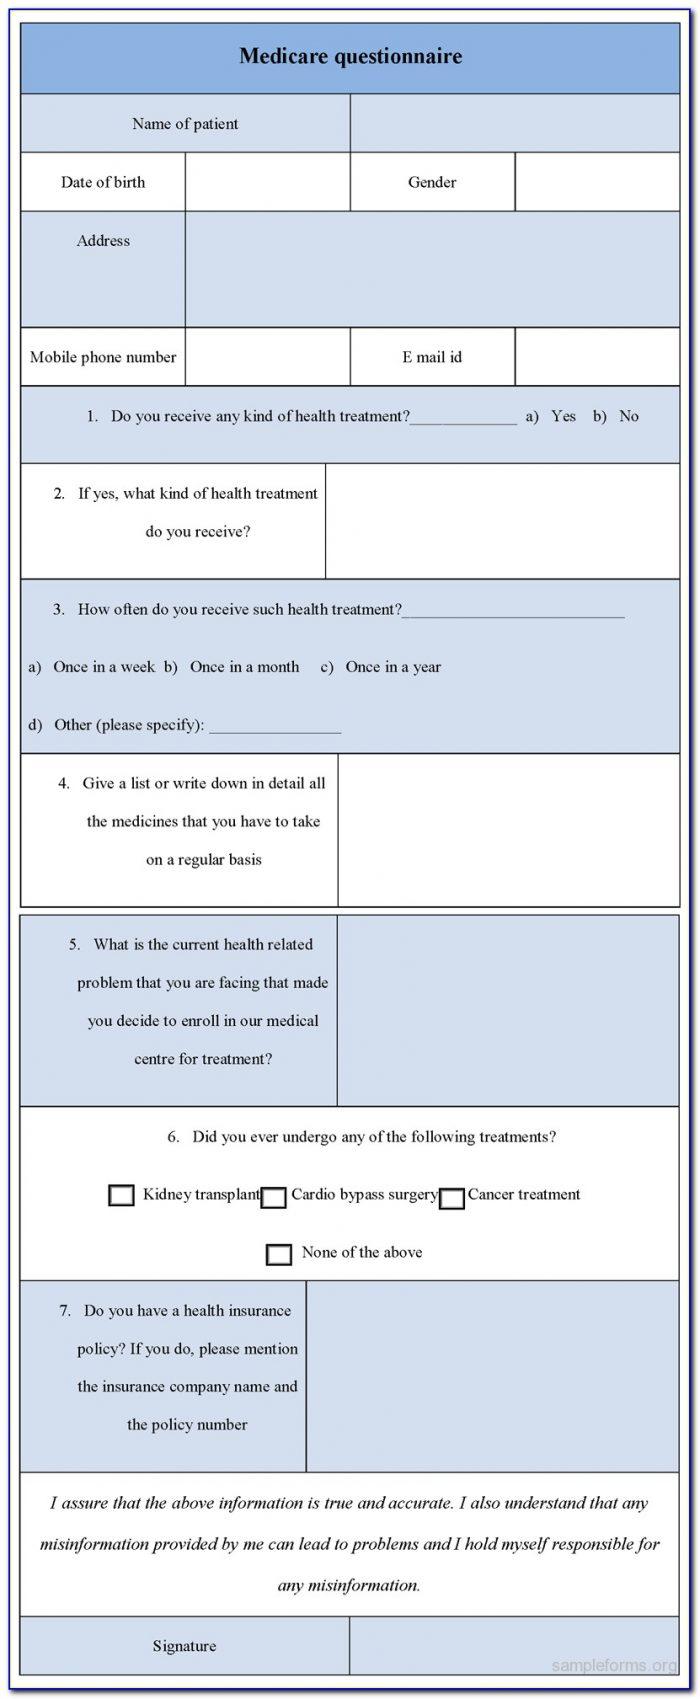 Medicare Initial Enrollment Questionnaire Form